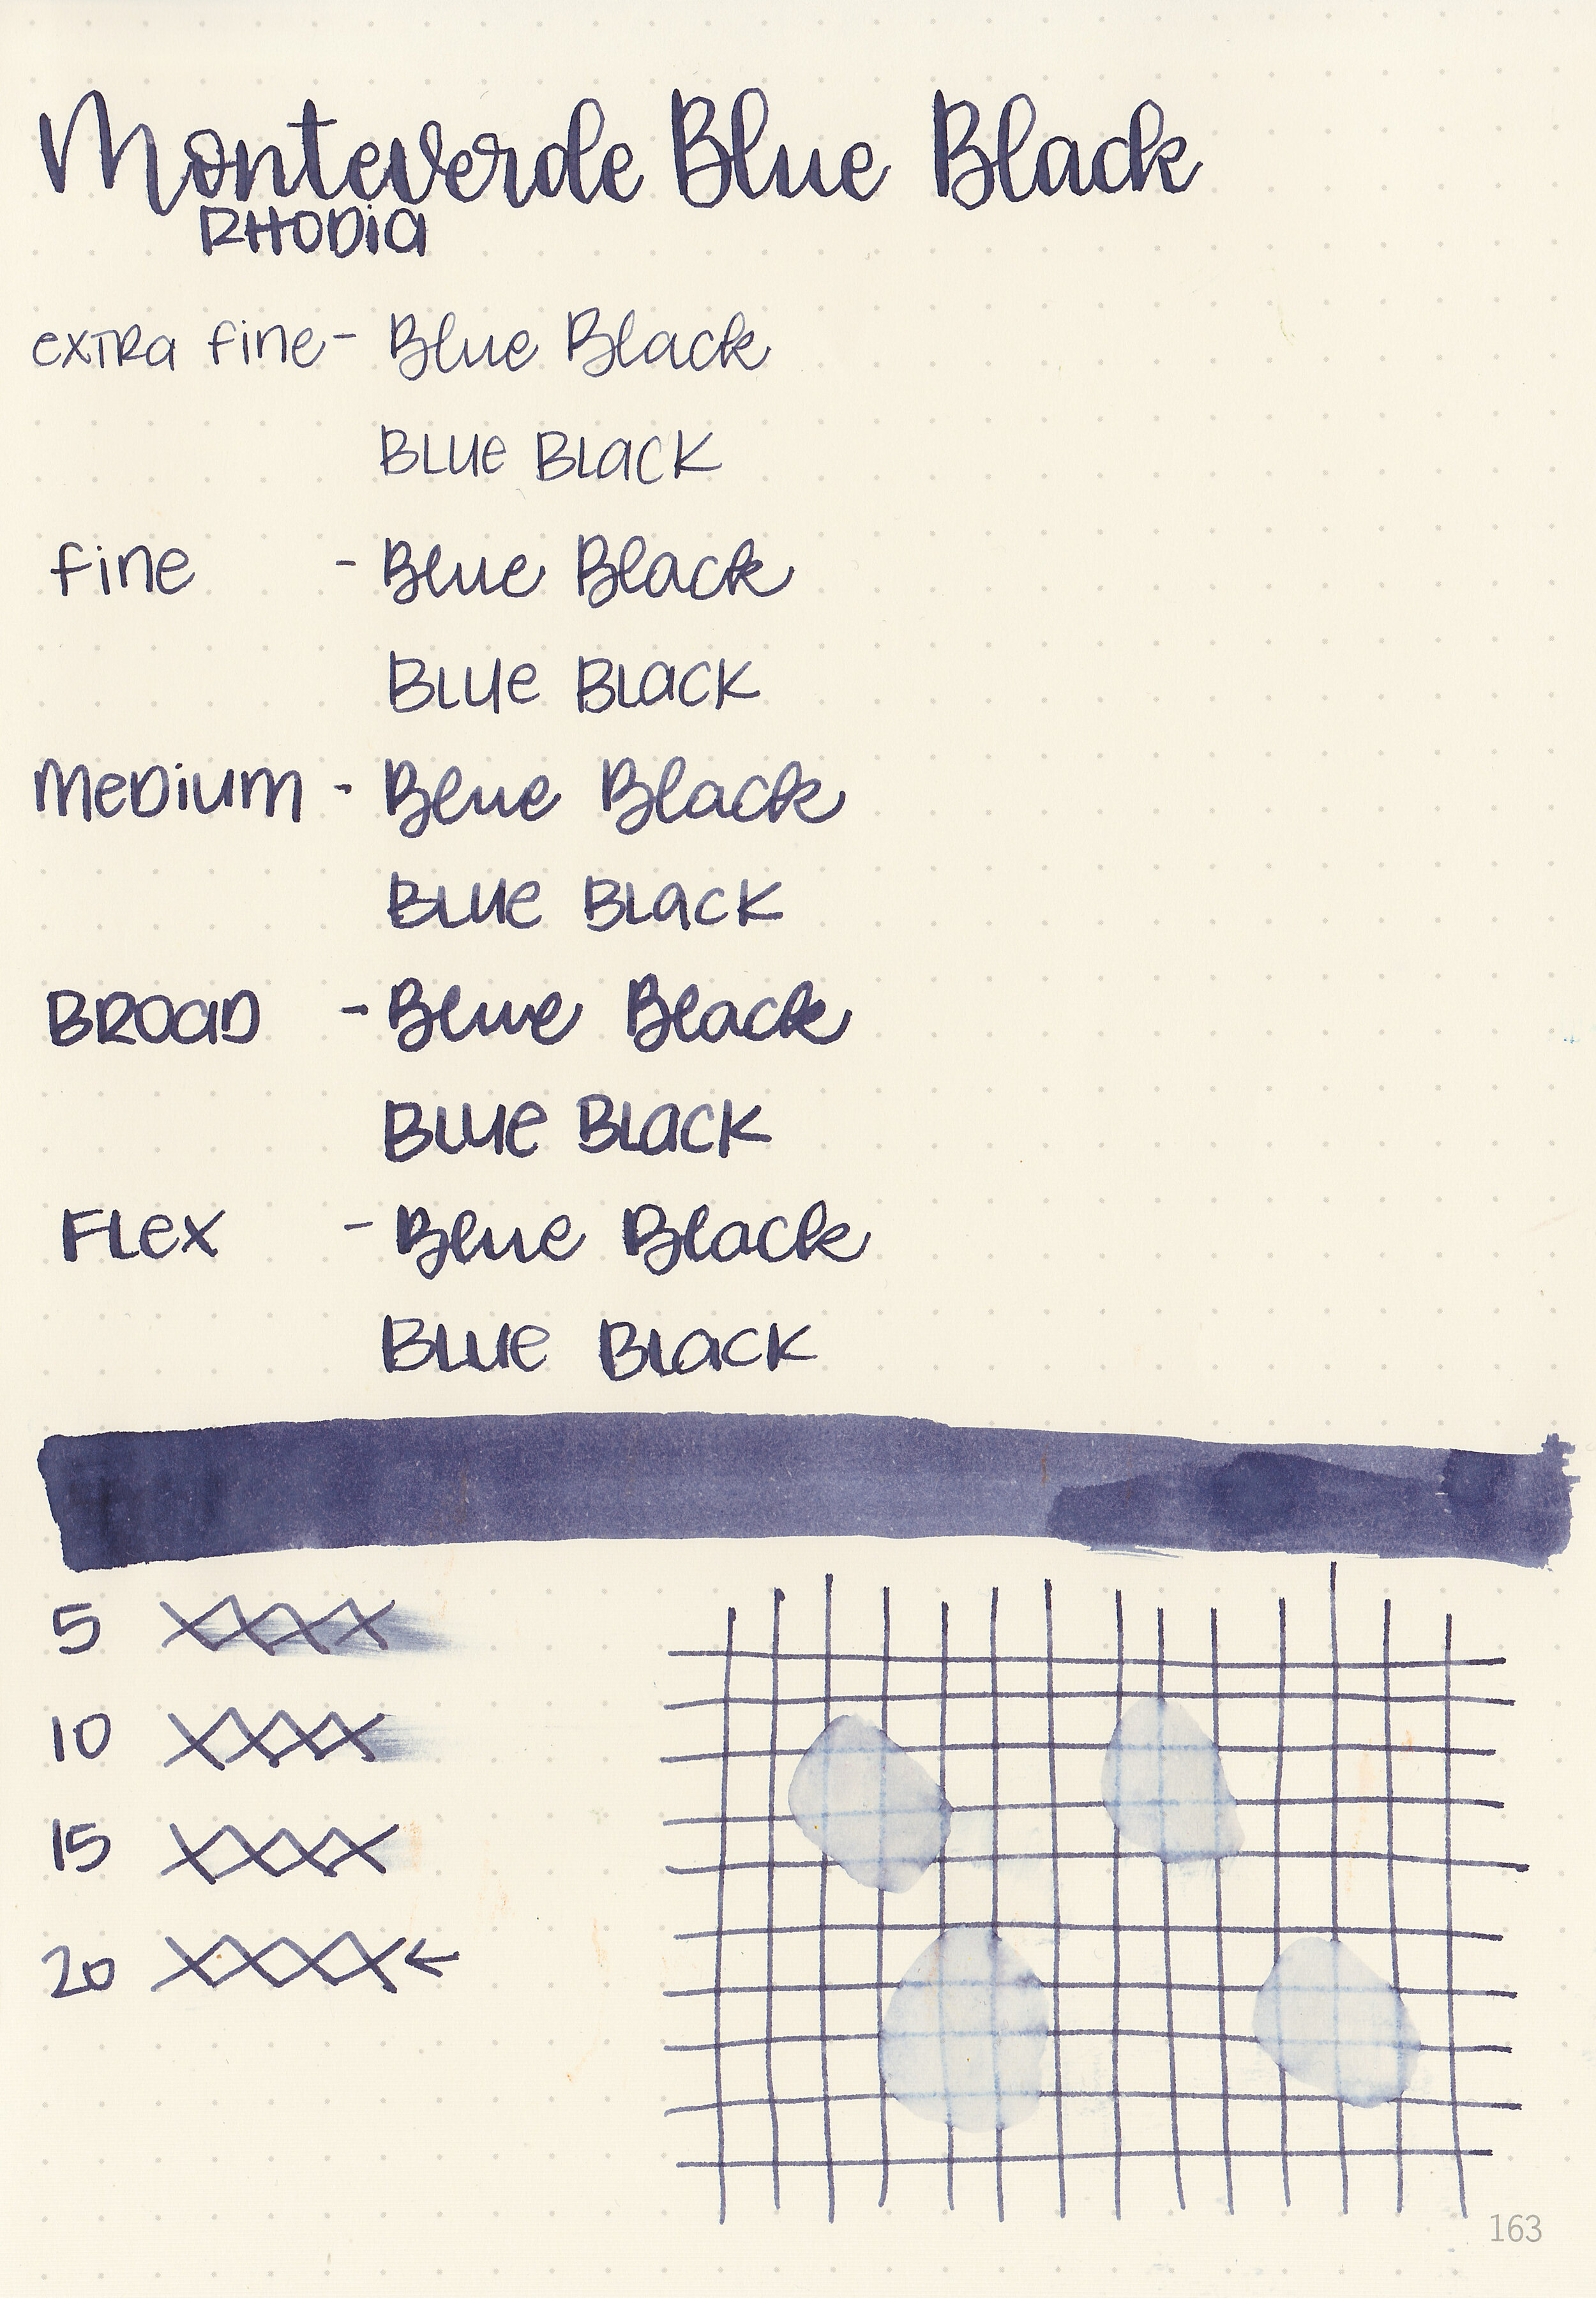 mv-blue-black-8.jpg